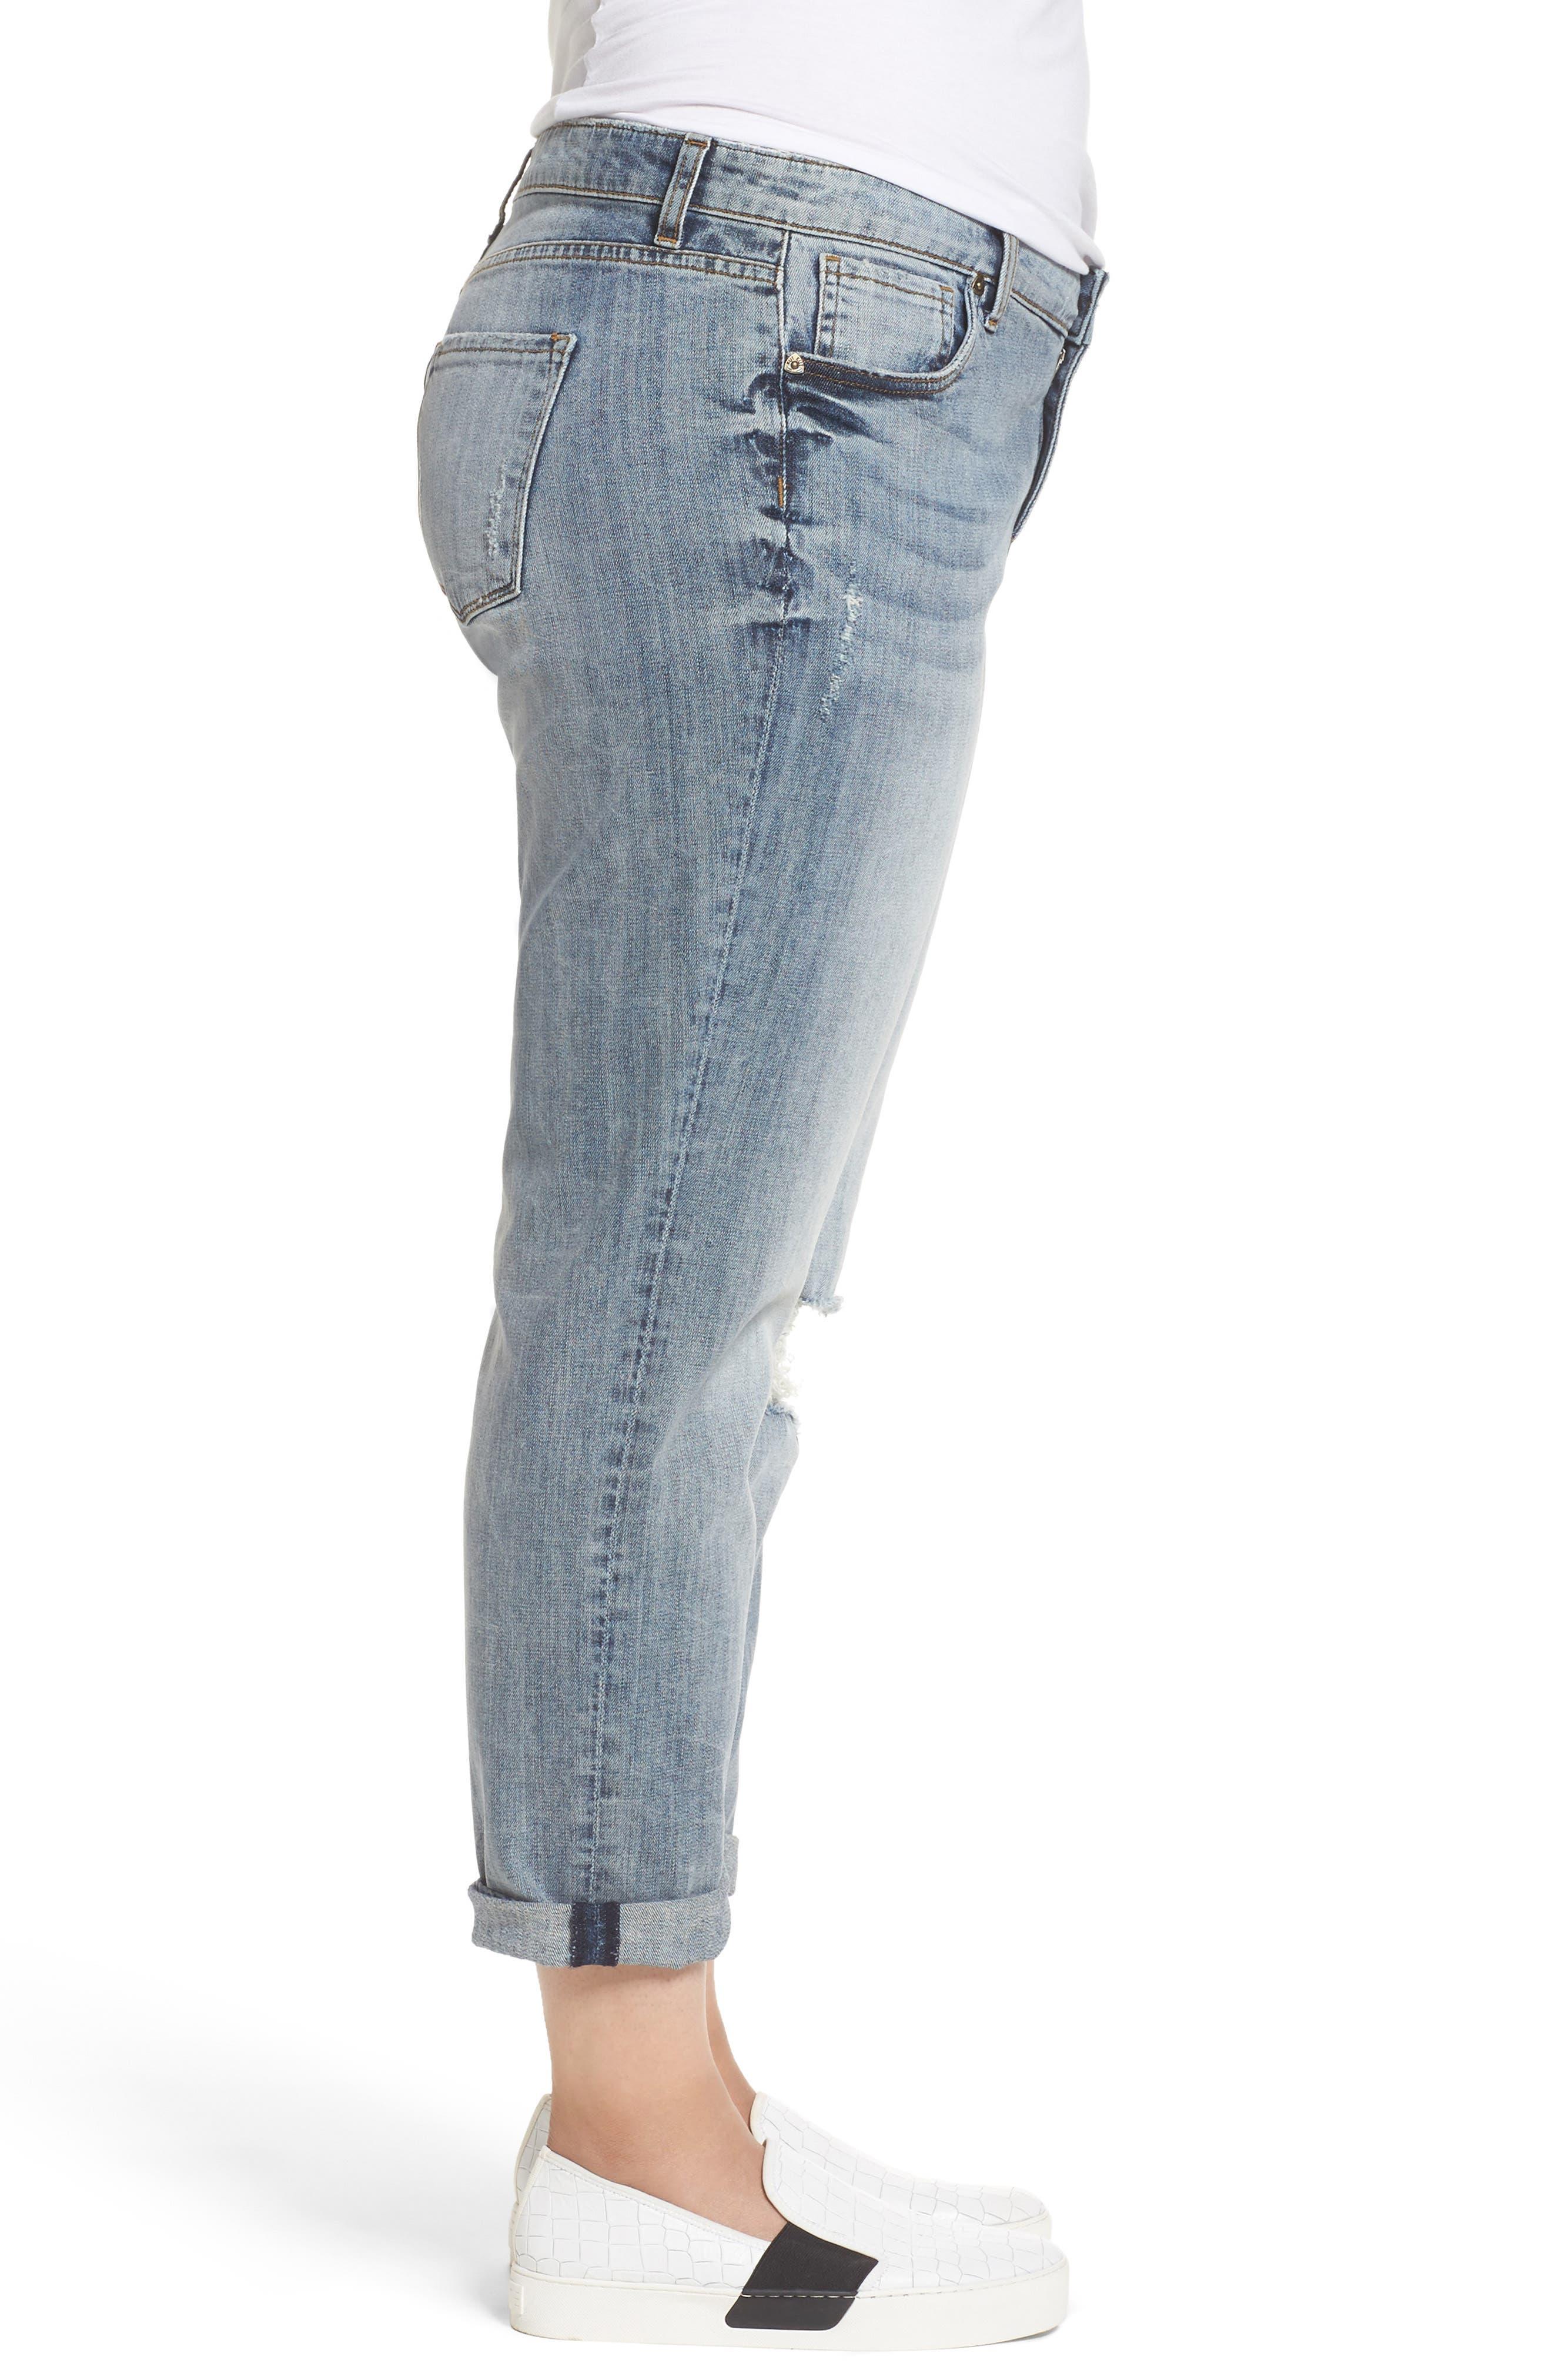 Alternate Image 3  - KUT from the Kloth Catherine Stretch Distressed Boyfriend Jeans (Regarded) (Plus Size)